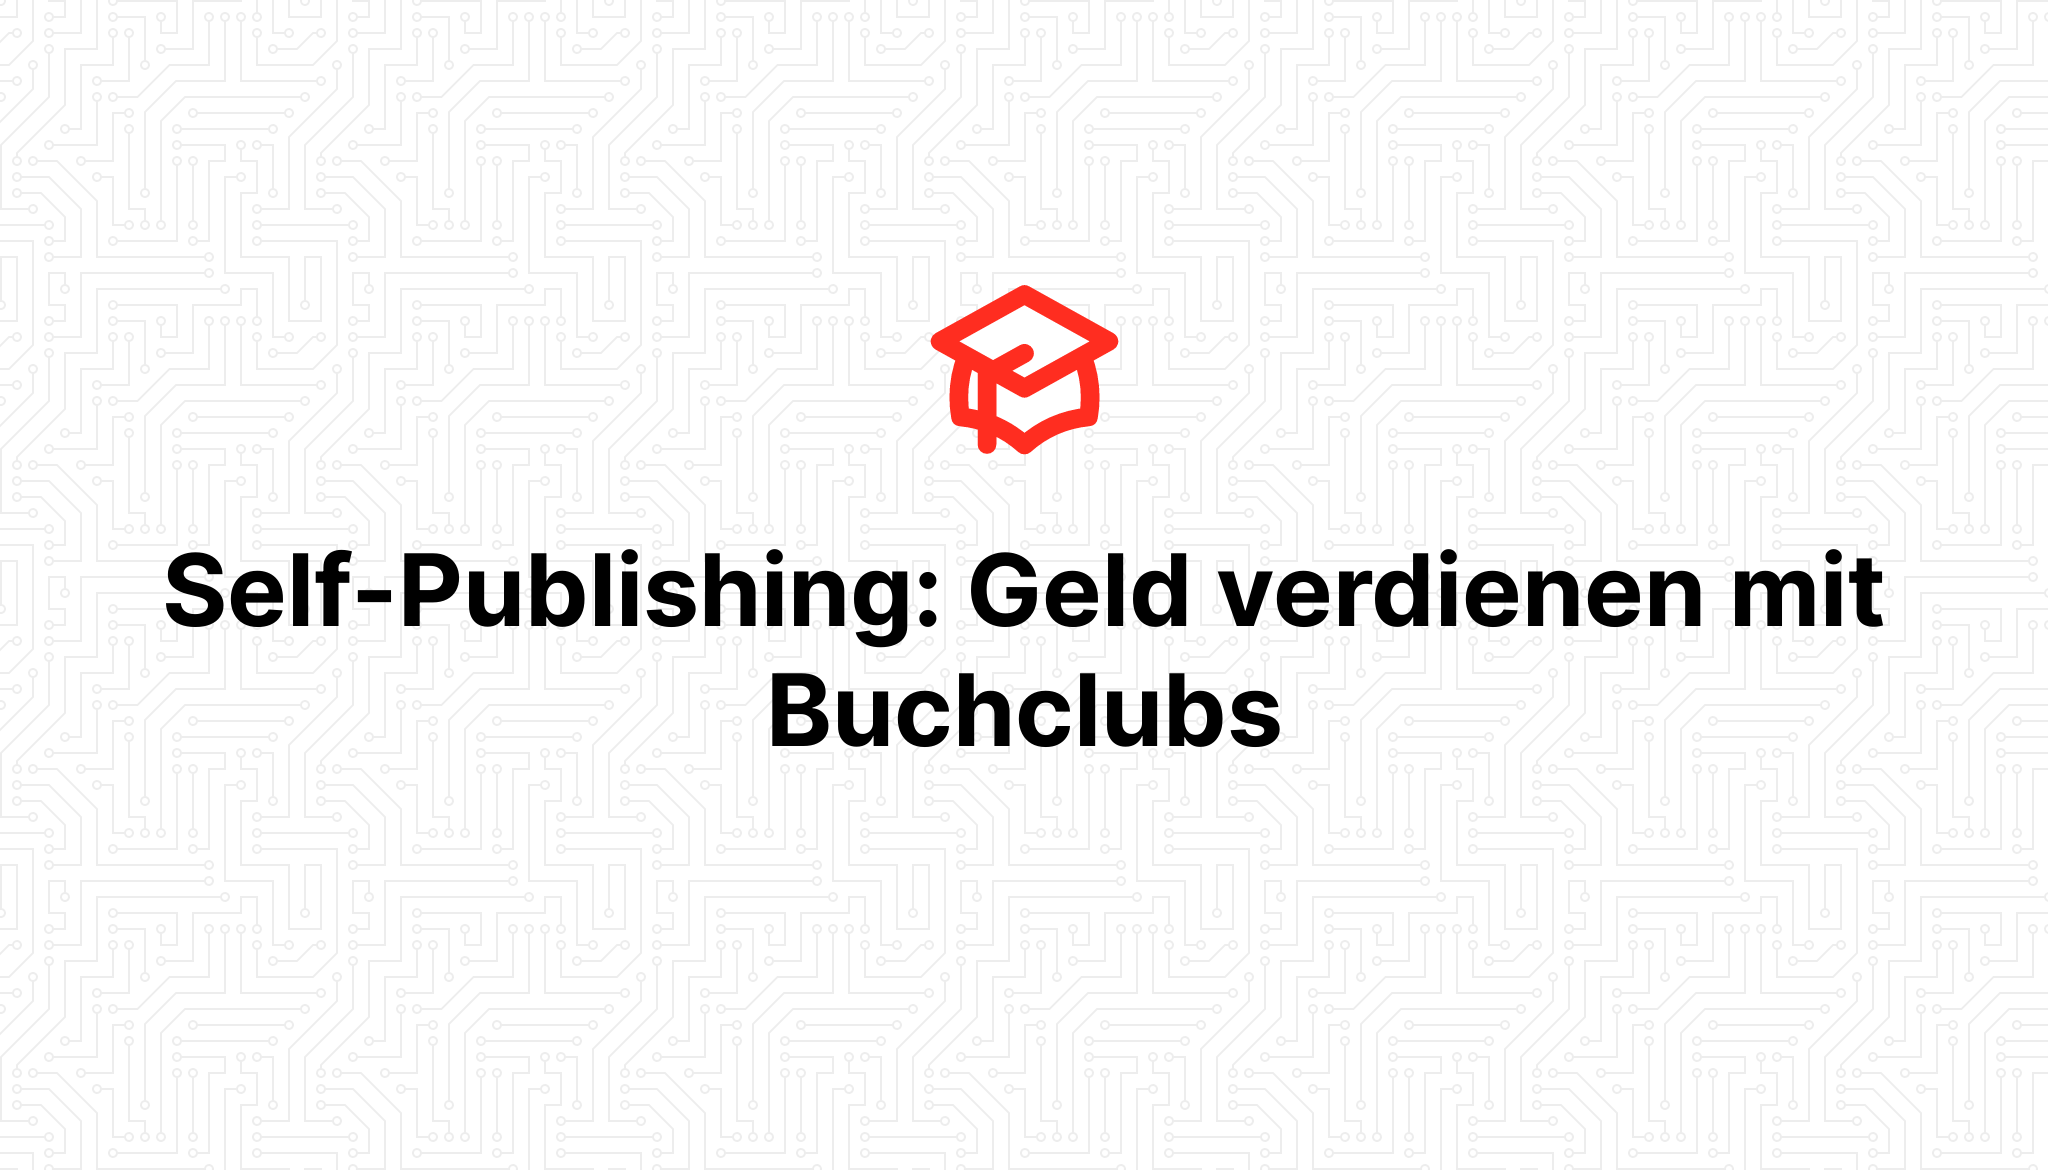 Self-Publishing: Geld verdienen mit Buchclubs